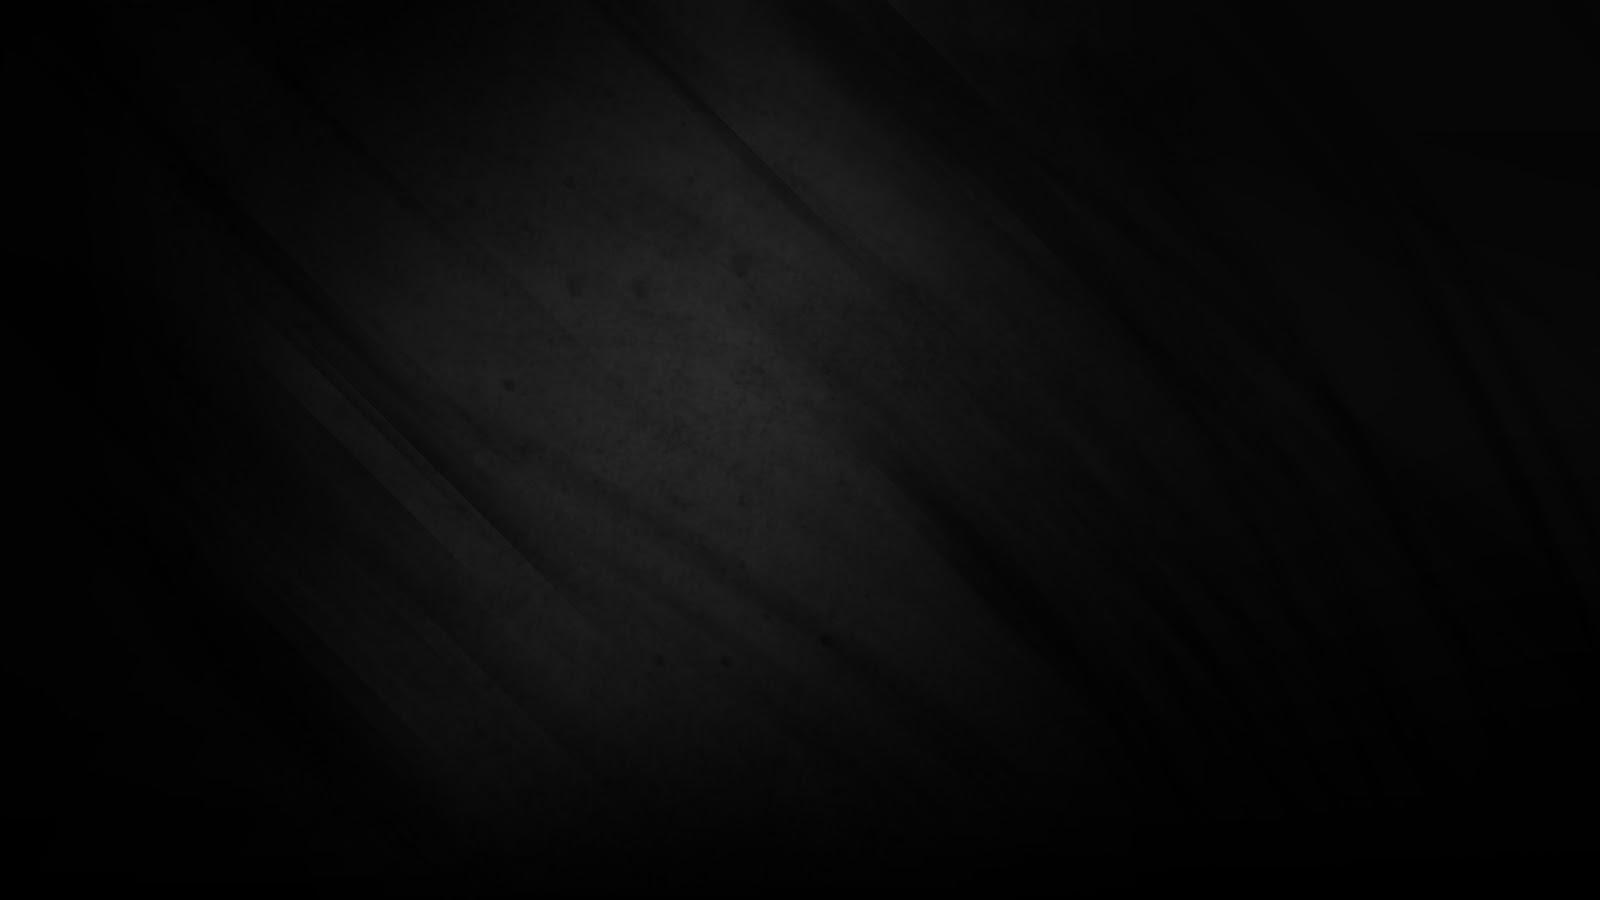 بالصور خلفية سوداء سادة , صور سوداء ساده 3612 4